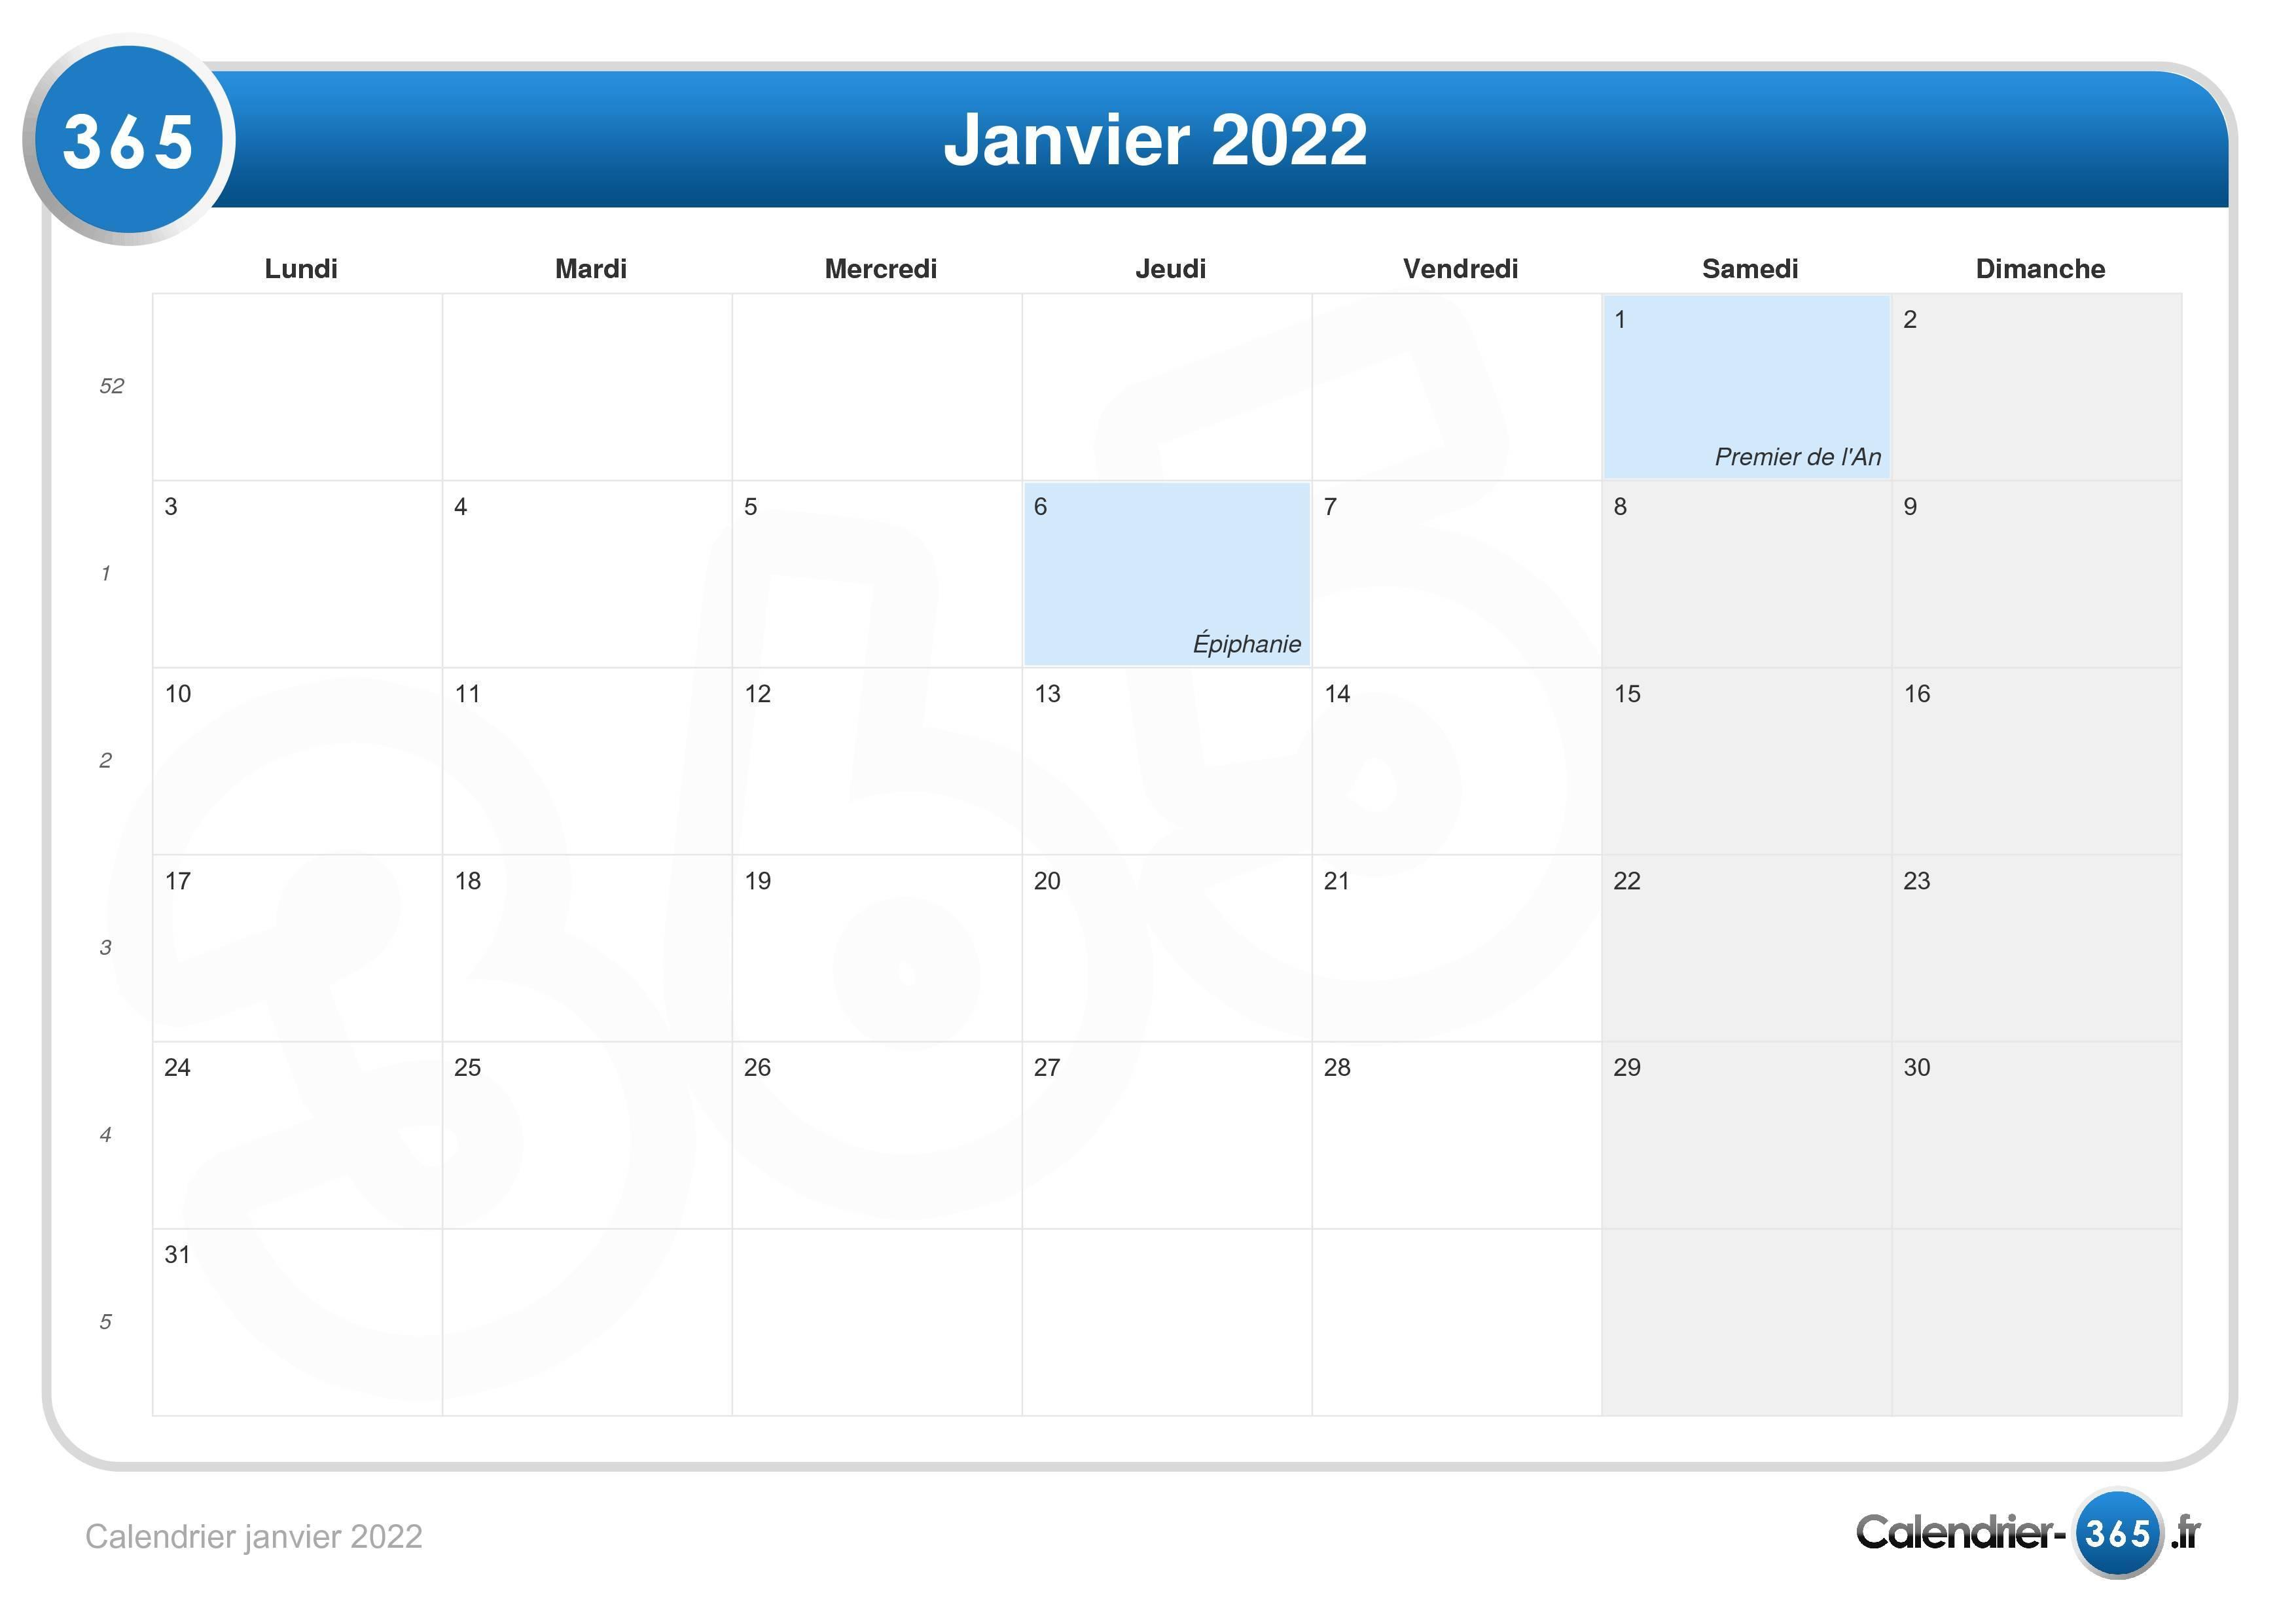 Janvier 2022 Calendrier Calendrier janvier 2022